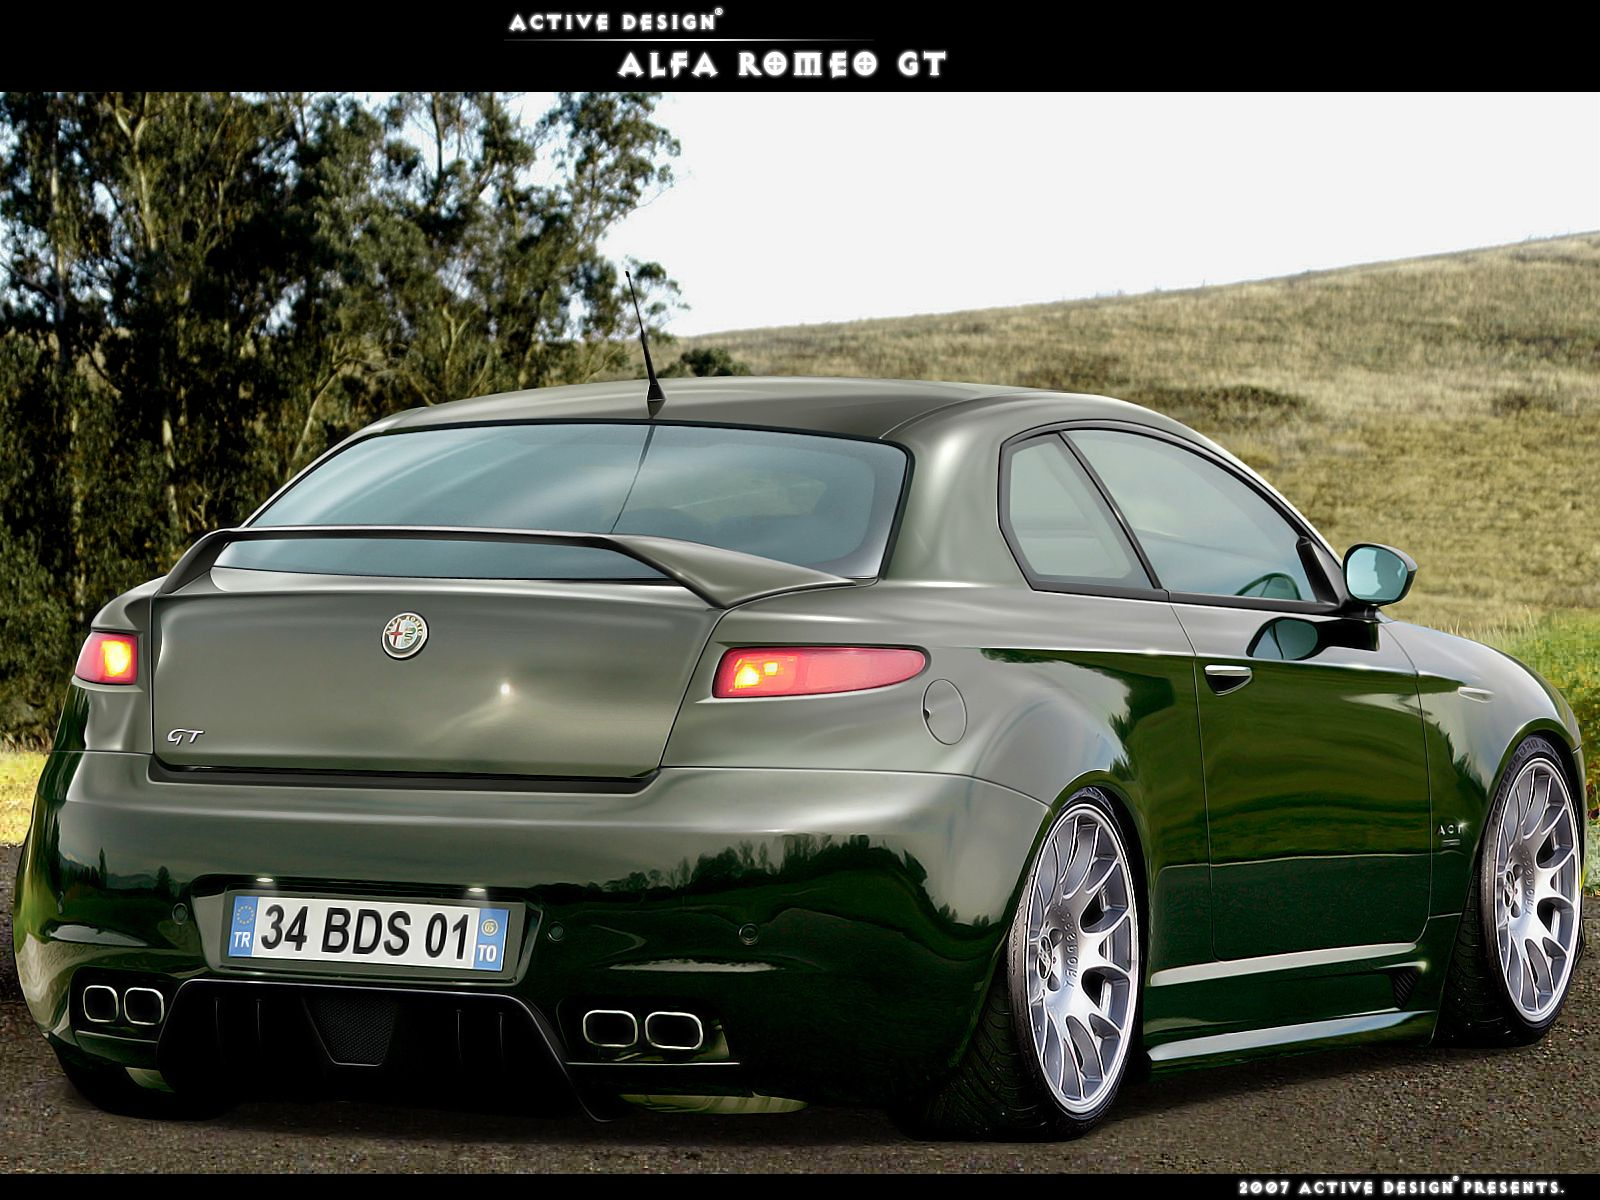 alfa romeo gtactive-design   veicoli   pinterest